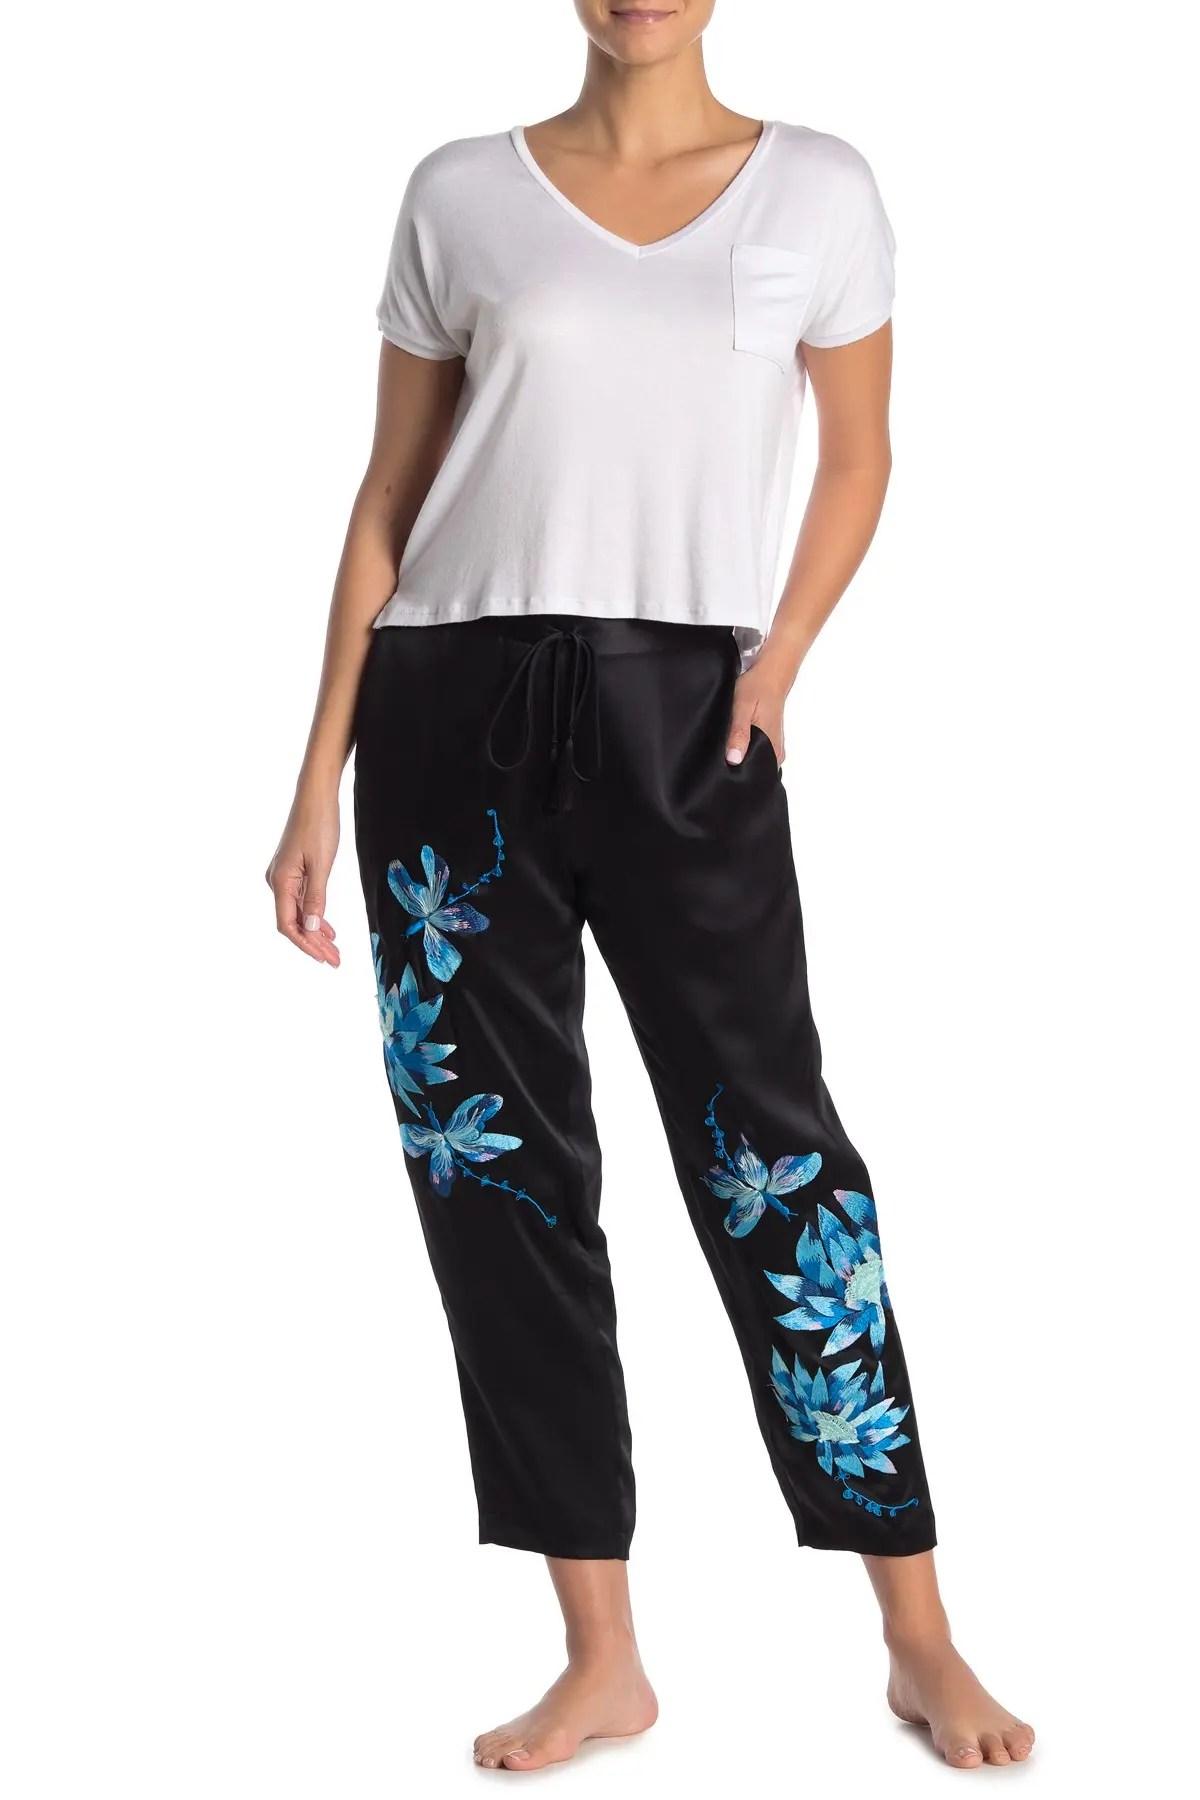 josie natori embroidered dragonfly silk pajama pants nordstrom rack